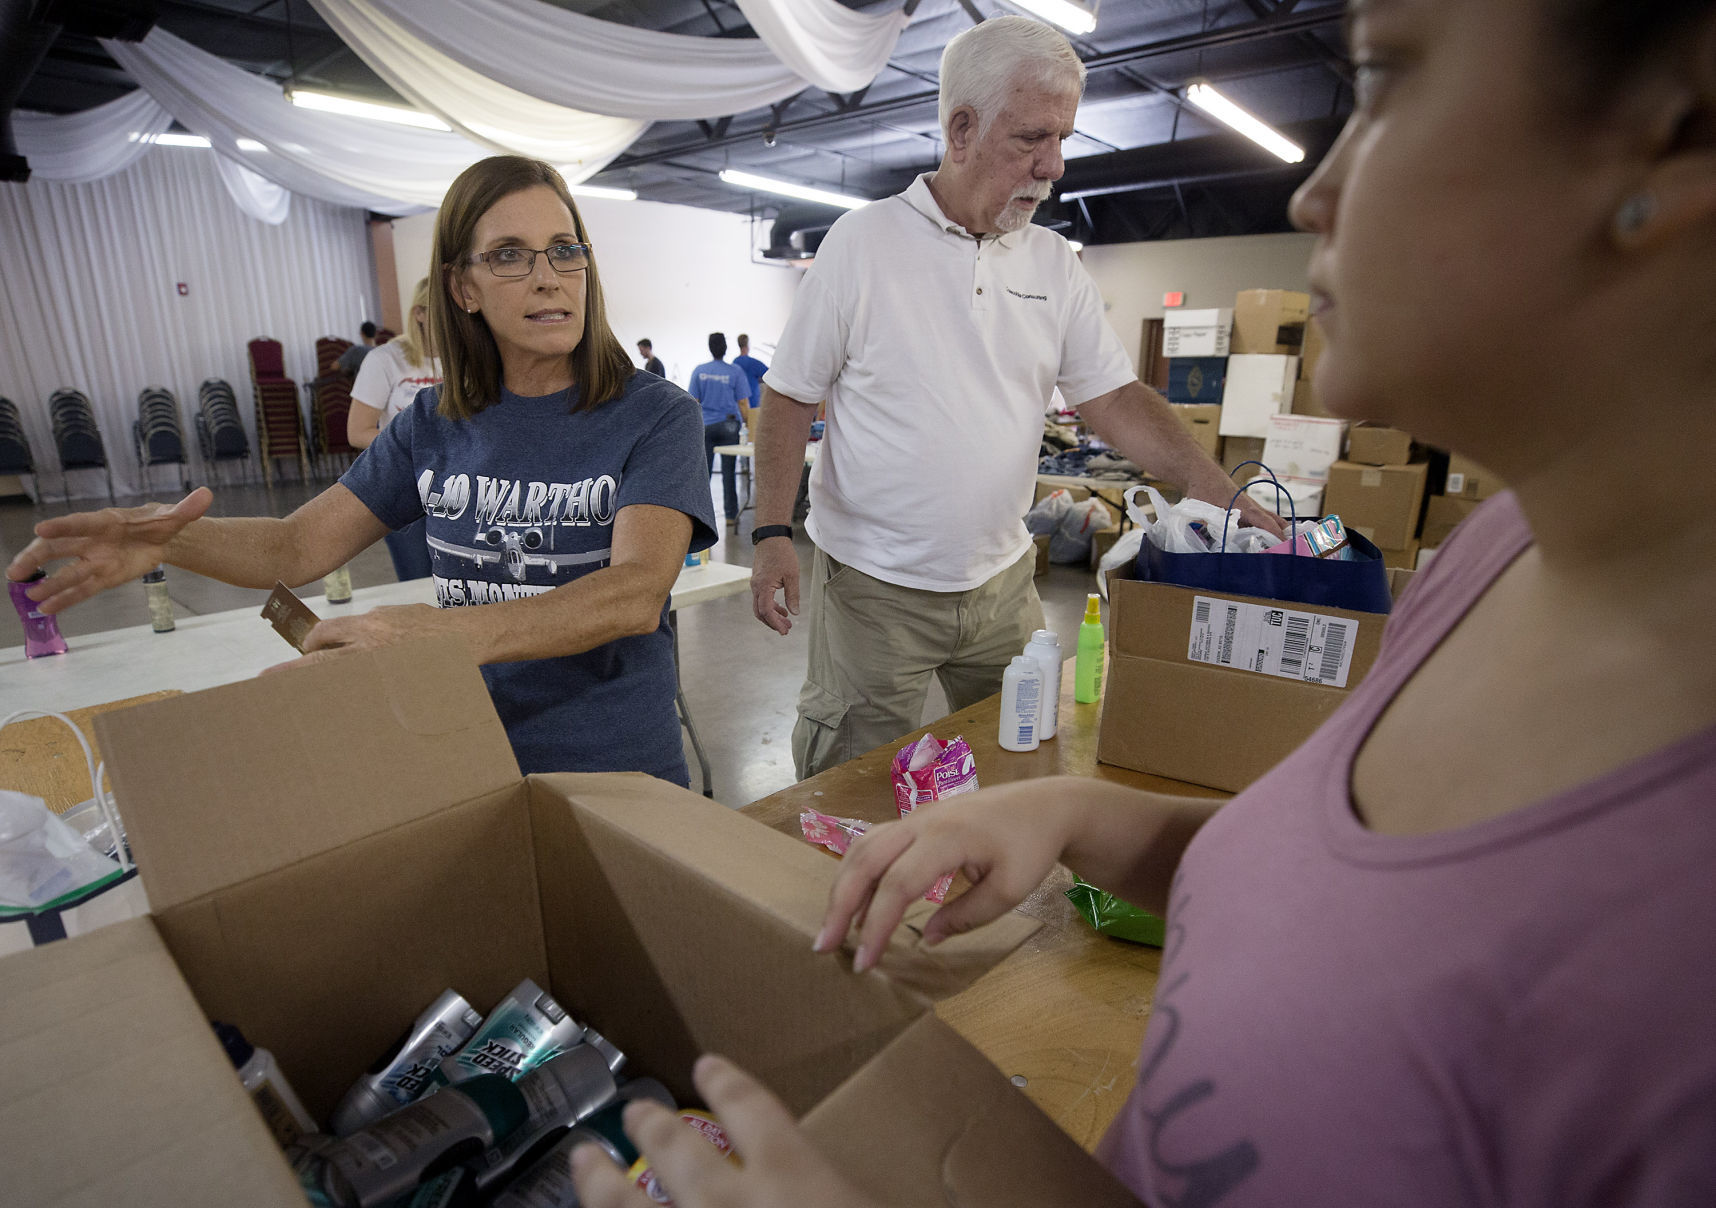 Rep. Martha McSally, after nod from Trump, helps set up Tucson veterans fair | Tucson.com